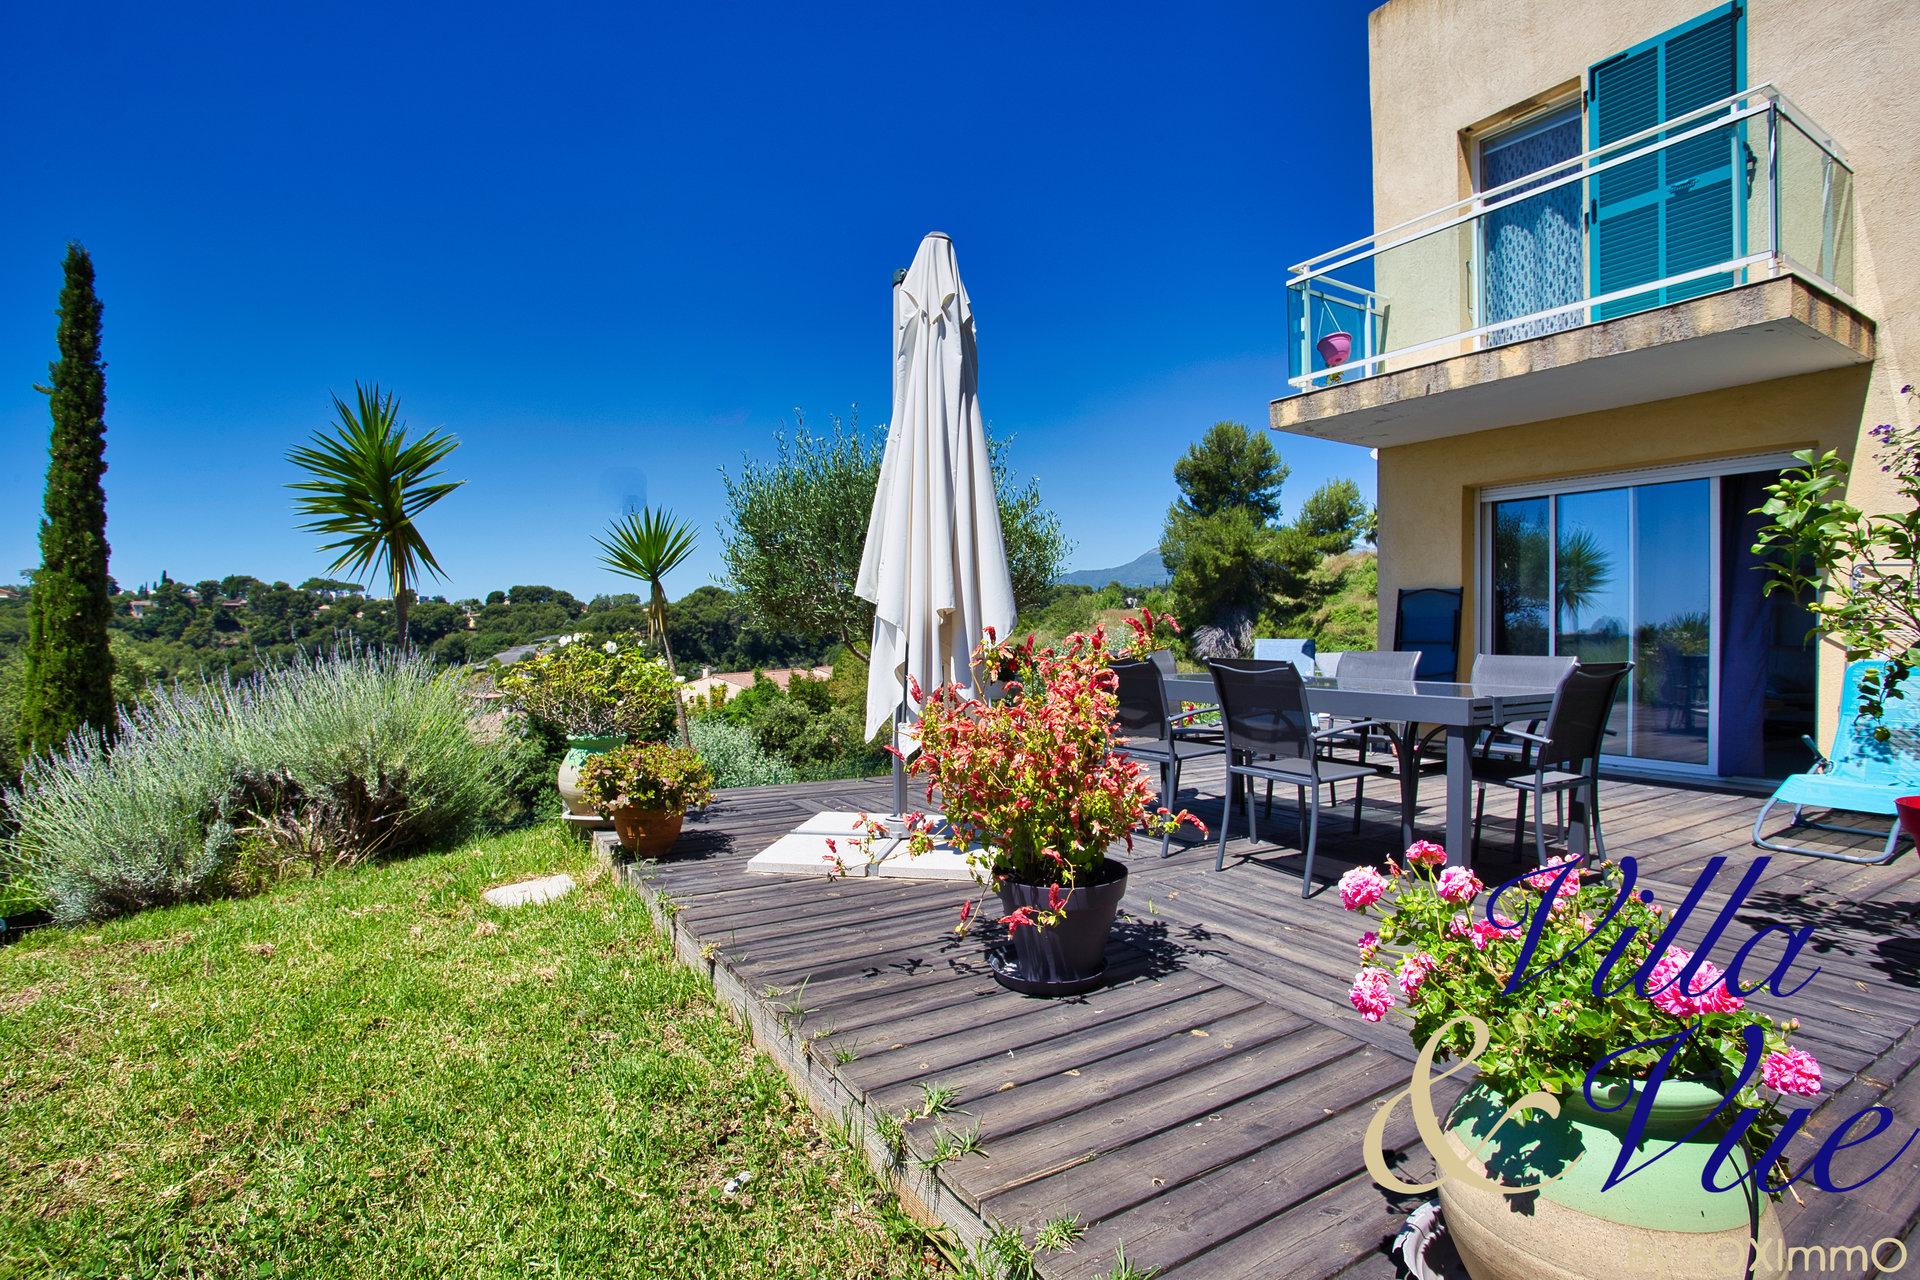 Casa unifamiliare in vendita, cagnes sur mer, tranquilla, vista mare